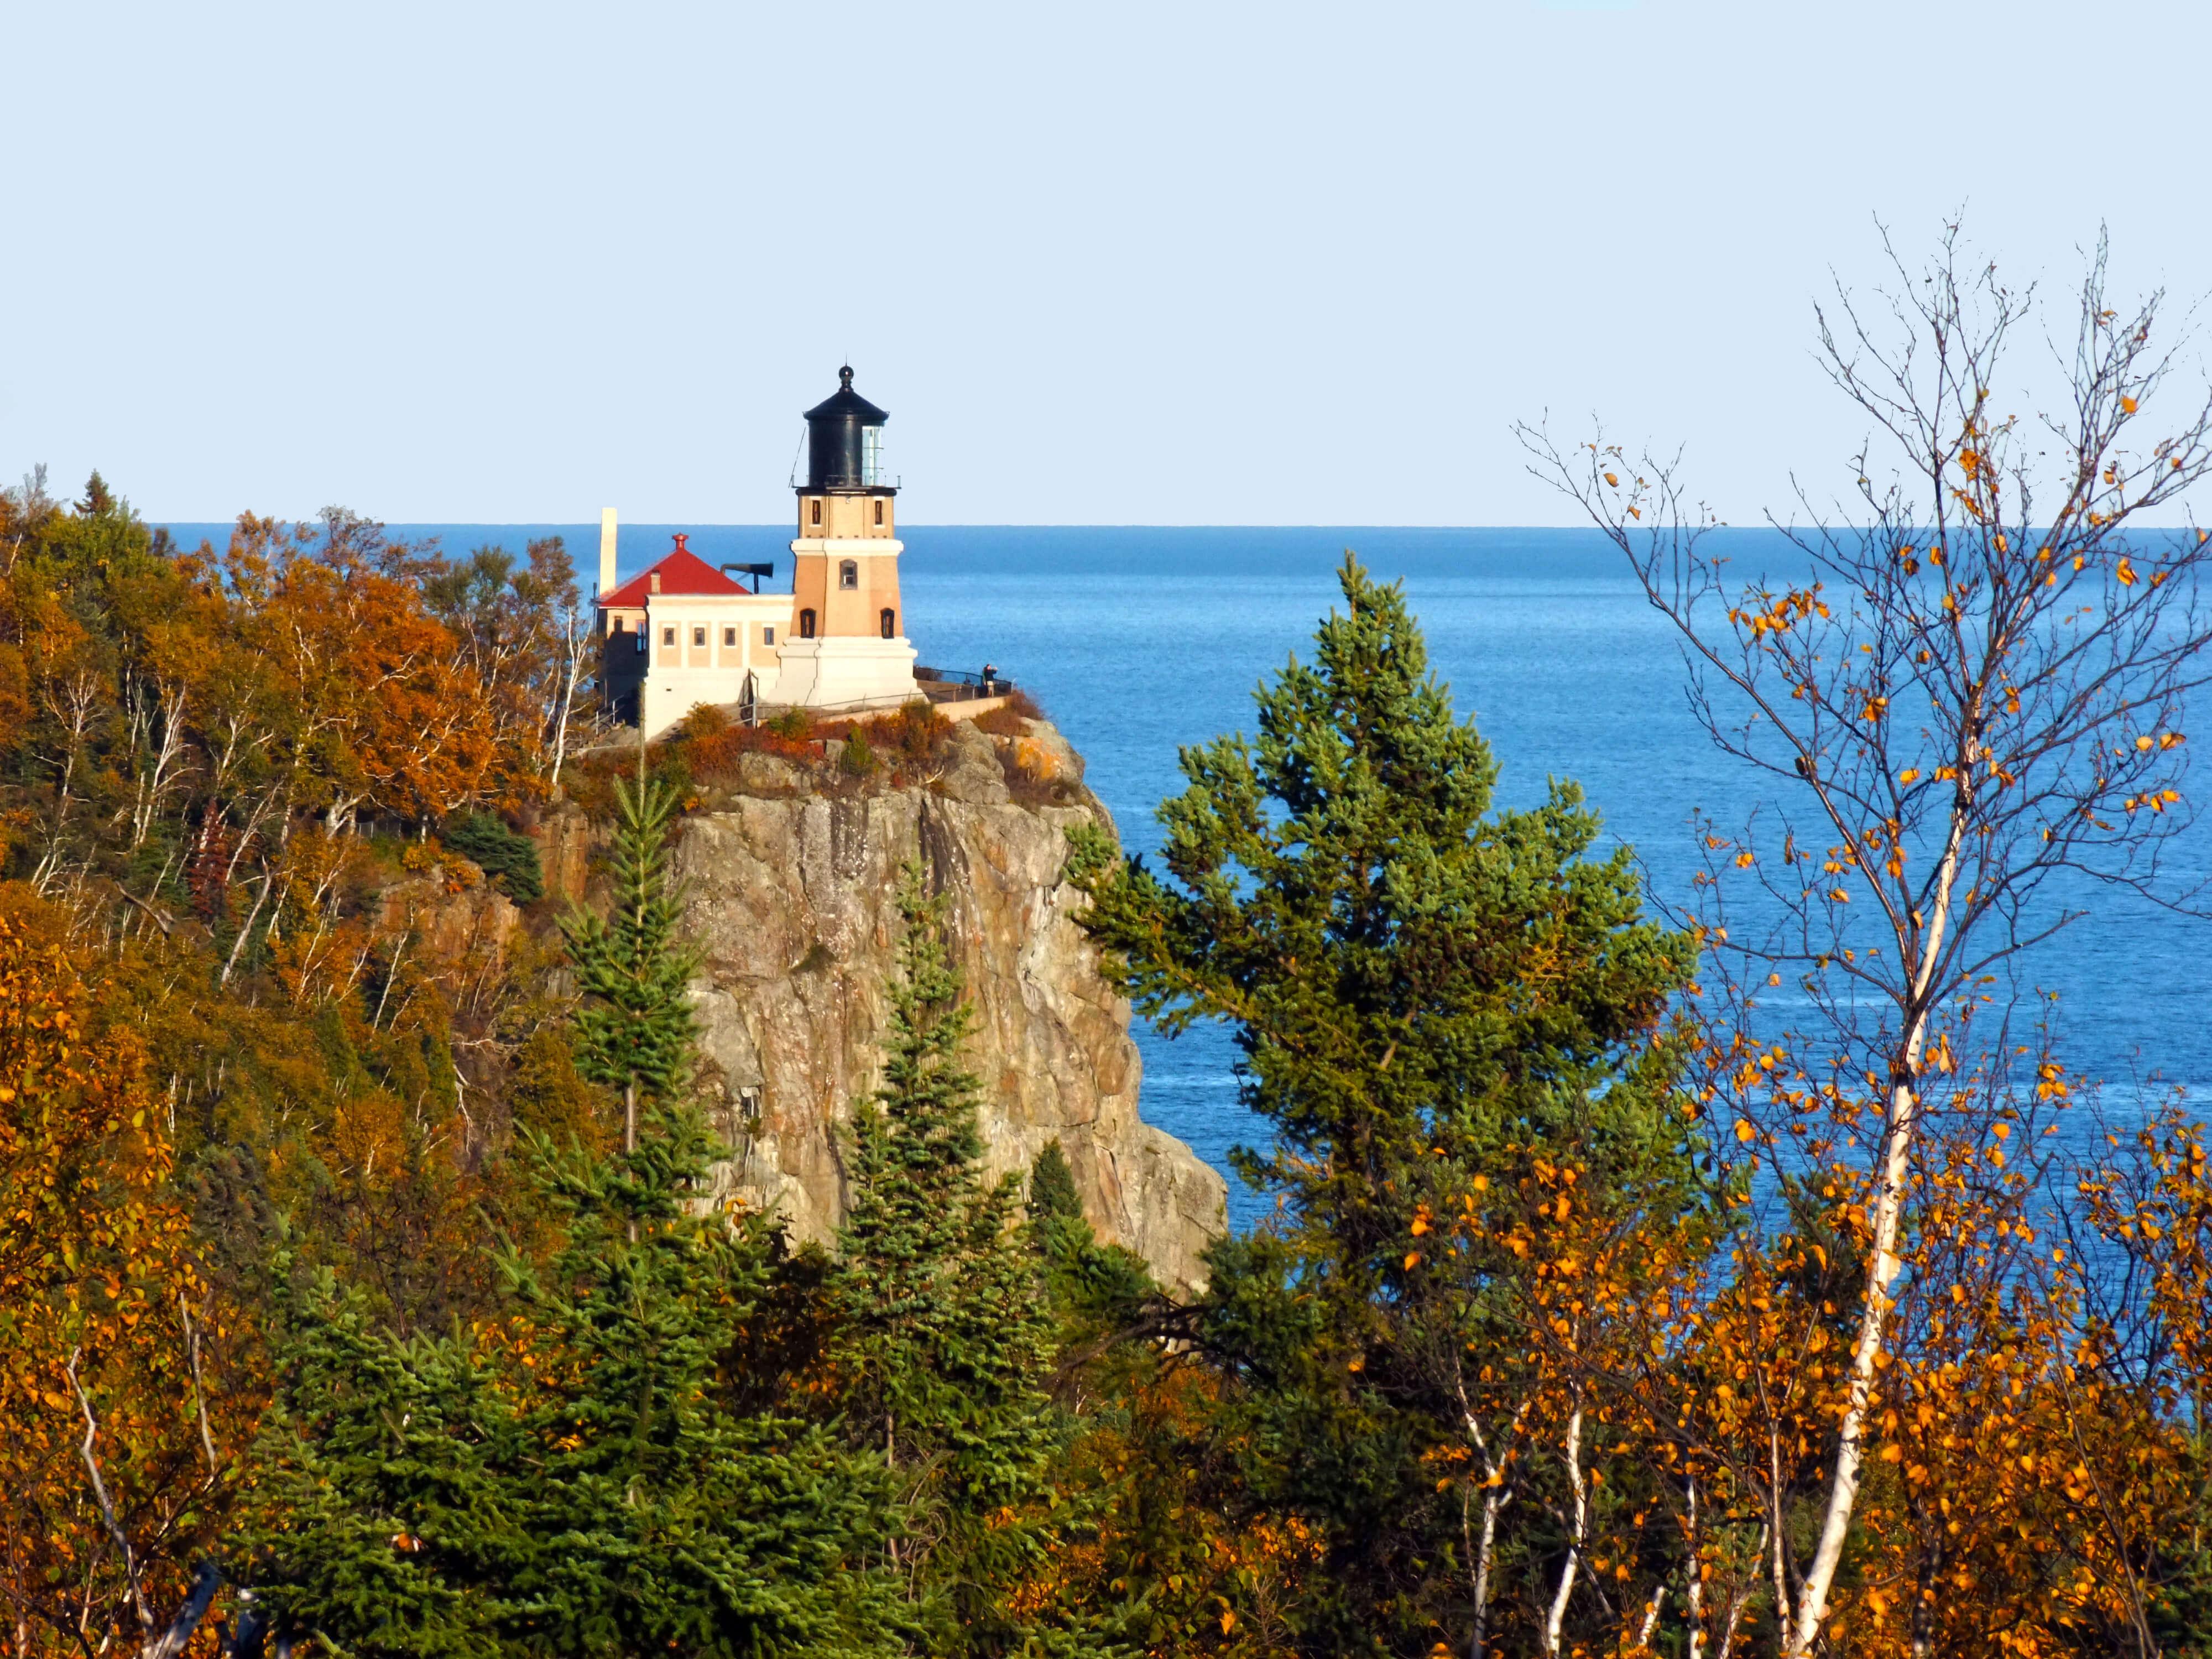 media_gallery-2020-03-11-4-Split_Rock_Lighthouse___North_Shore_of_Lake_Superior_d669c6b3ded9abe5d8367d0b31ae4192.jpg